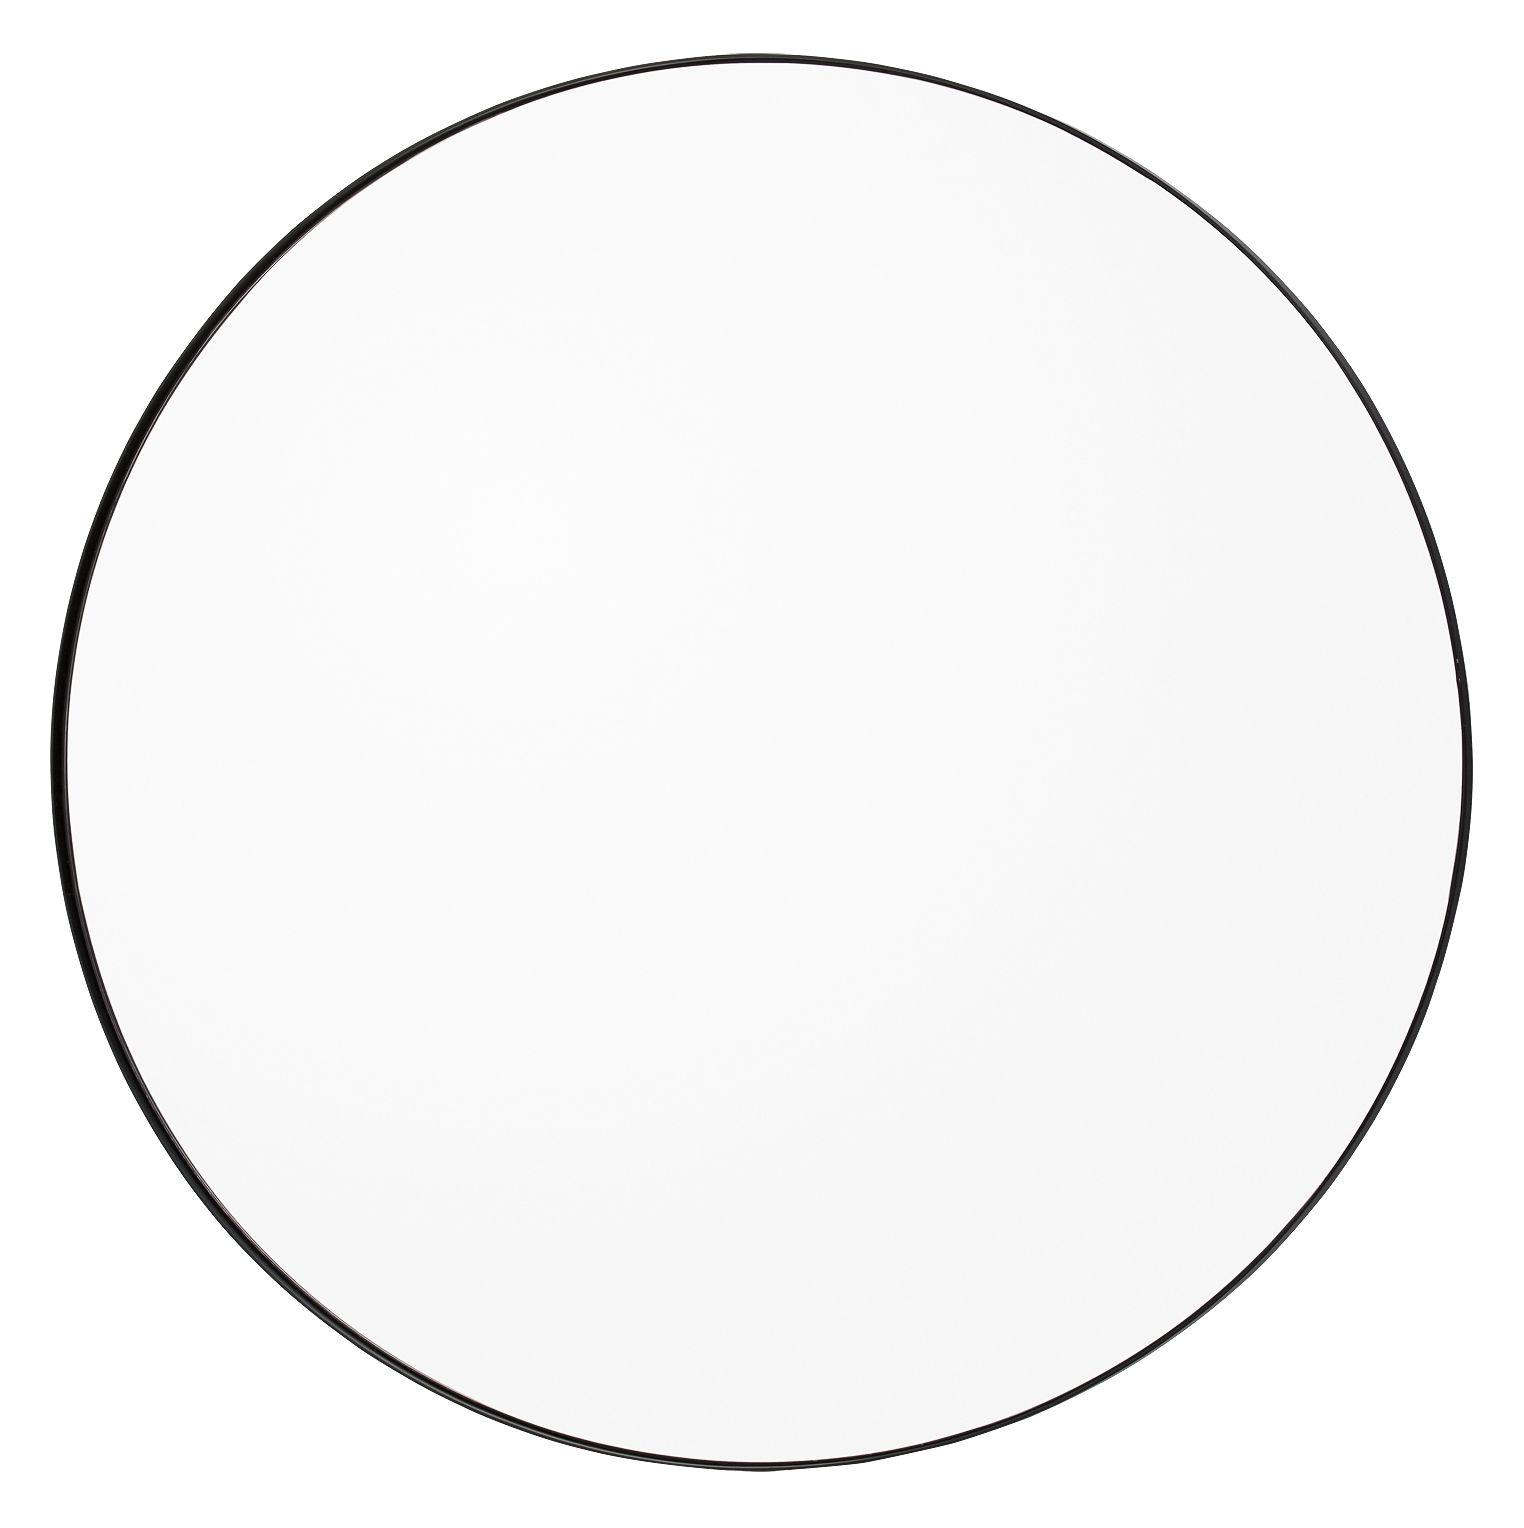 Déco - Miroirs - Miroir mural Circum Large / Ø 110 cm - AYTM - Clair / Cadre noir - MDF peint, Verre